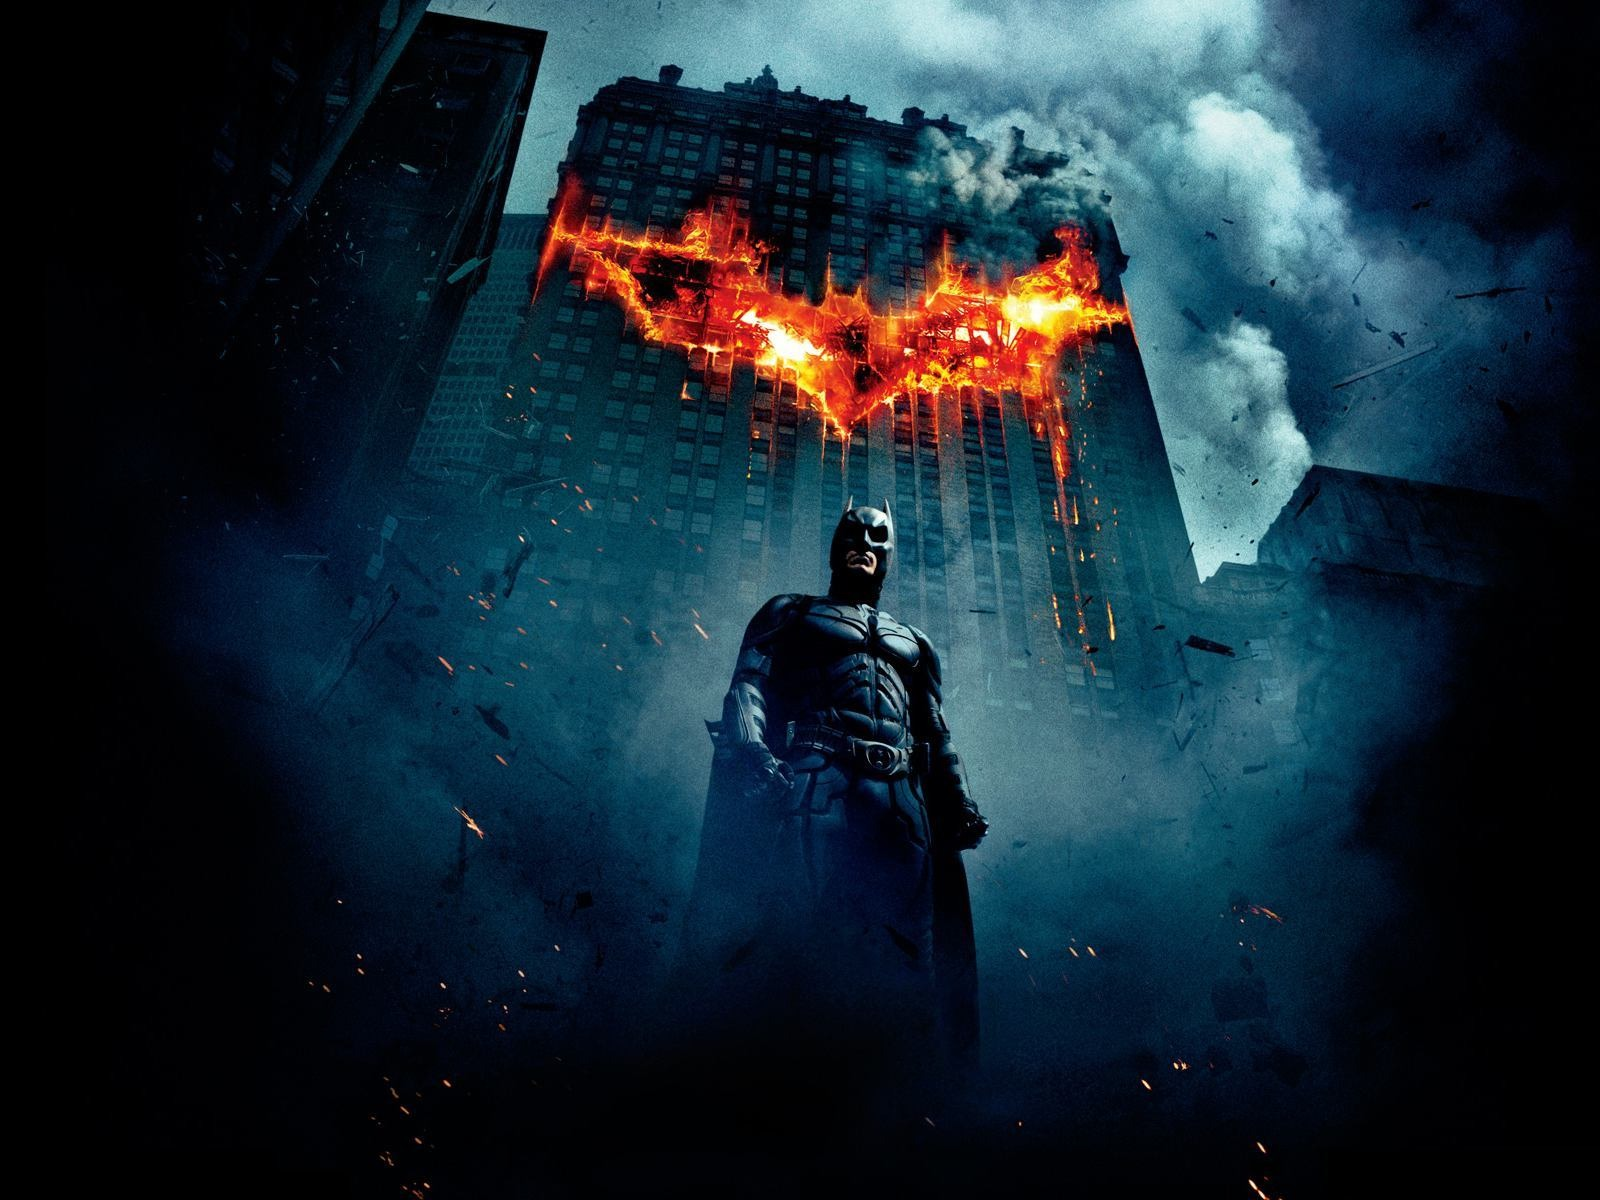 Dark Knight Wallpaper Pinterest'te hakkında 1000'den fazla fikir